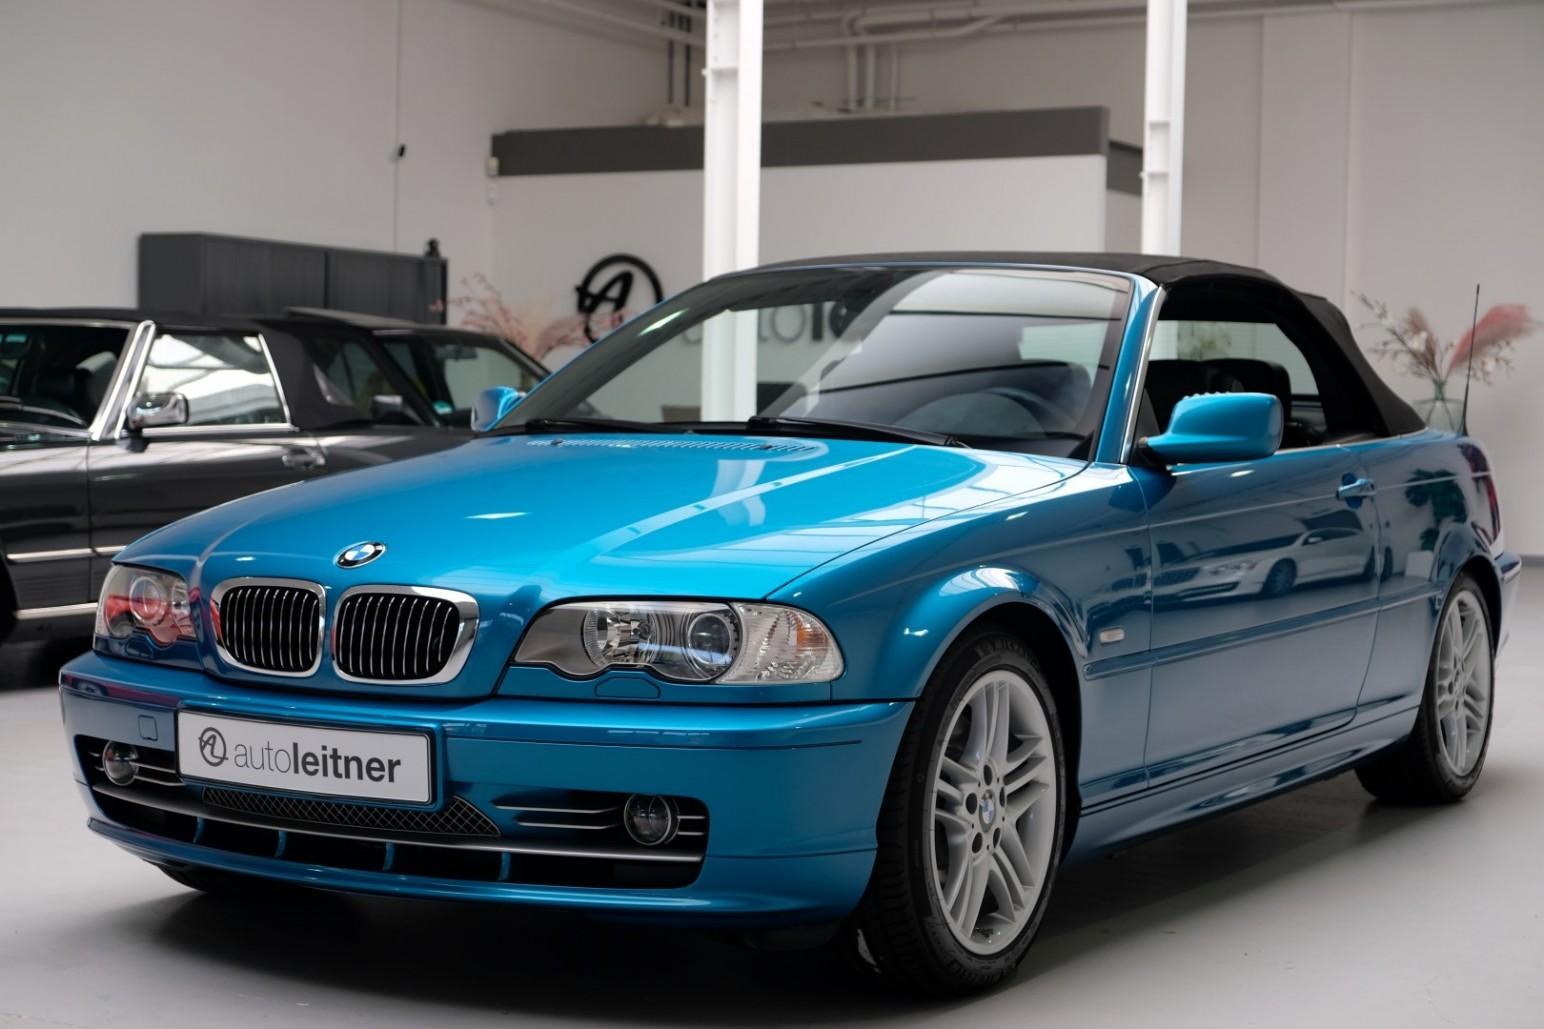 BMW 330Ci Cabrio de vanzare - BMW 330Ci Cabrio de vanzare